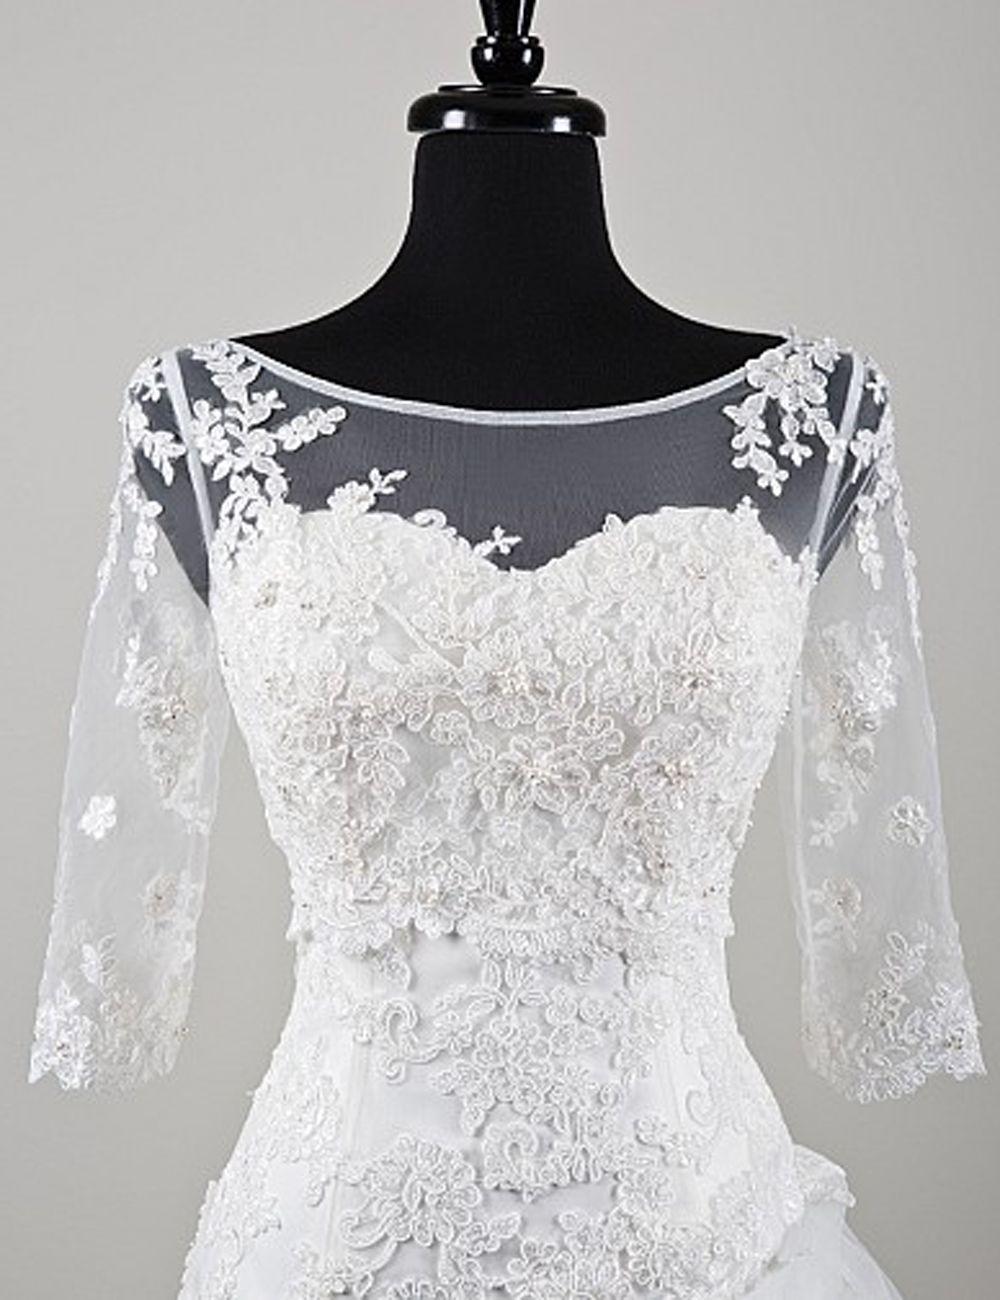 Find More Wedding Jackets Wrap Information About Illusion Top Boat Neck Half Sleeves Lace Applique Bri Bridal Jacket Lace Bridal Dresses Online Bridal Jacket